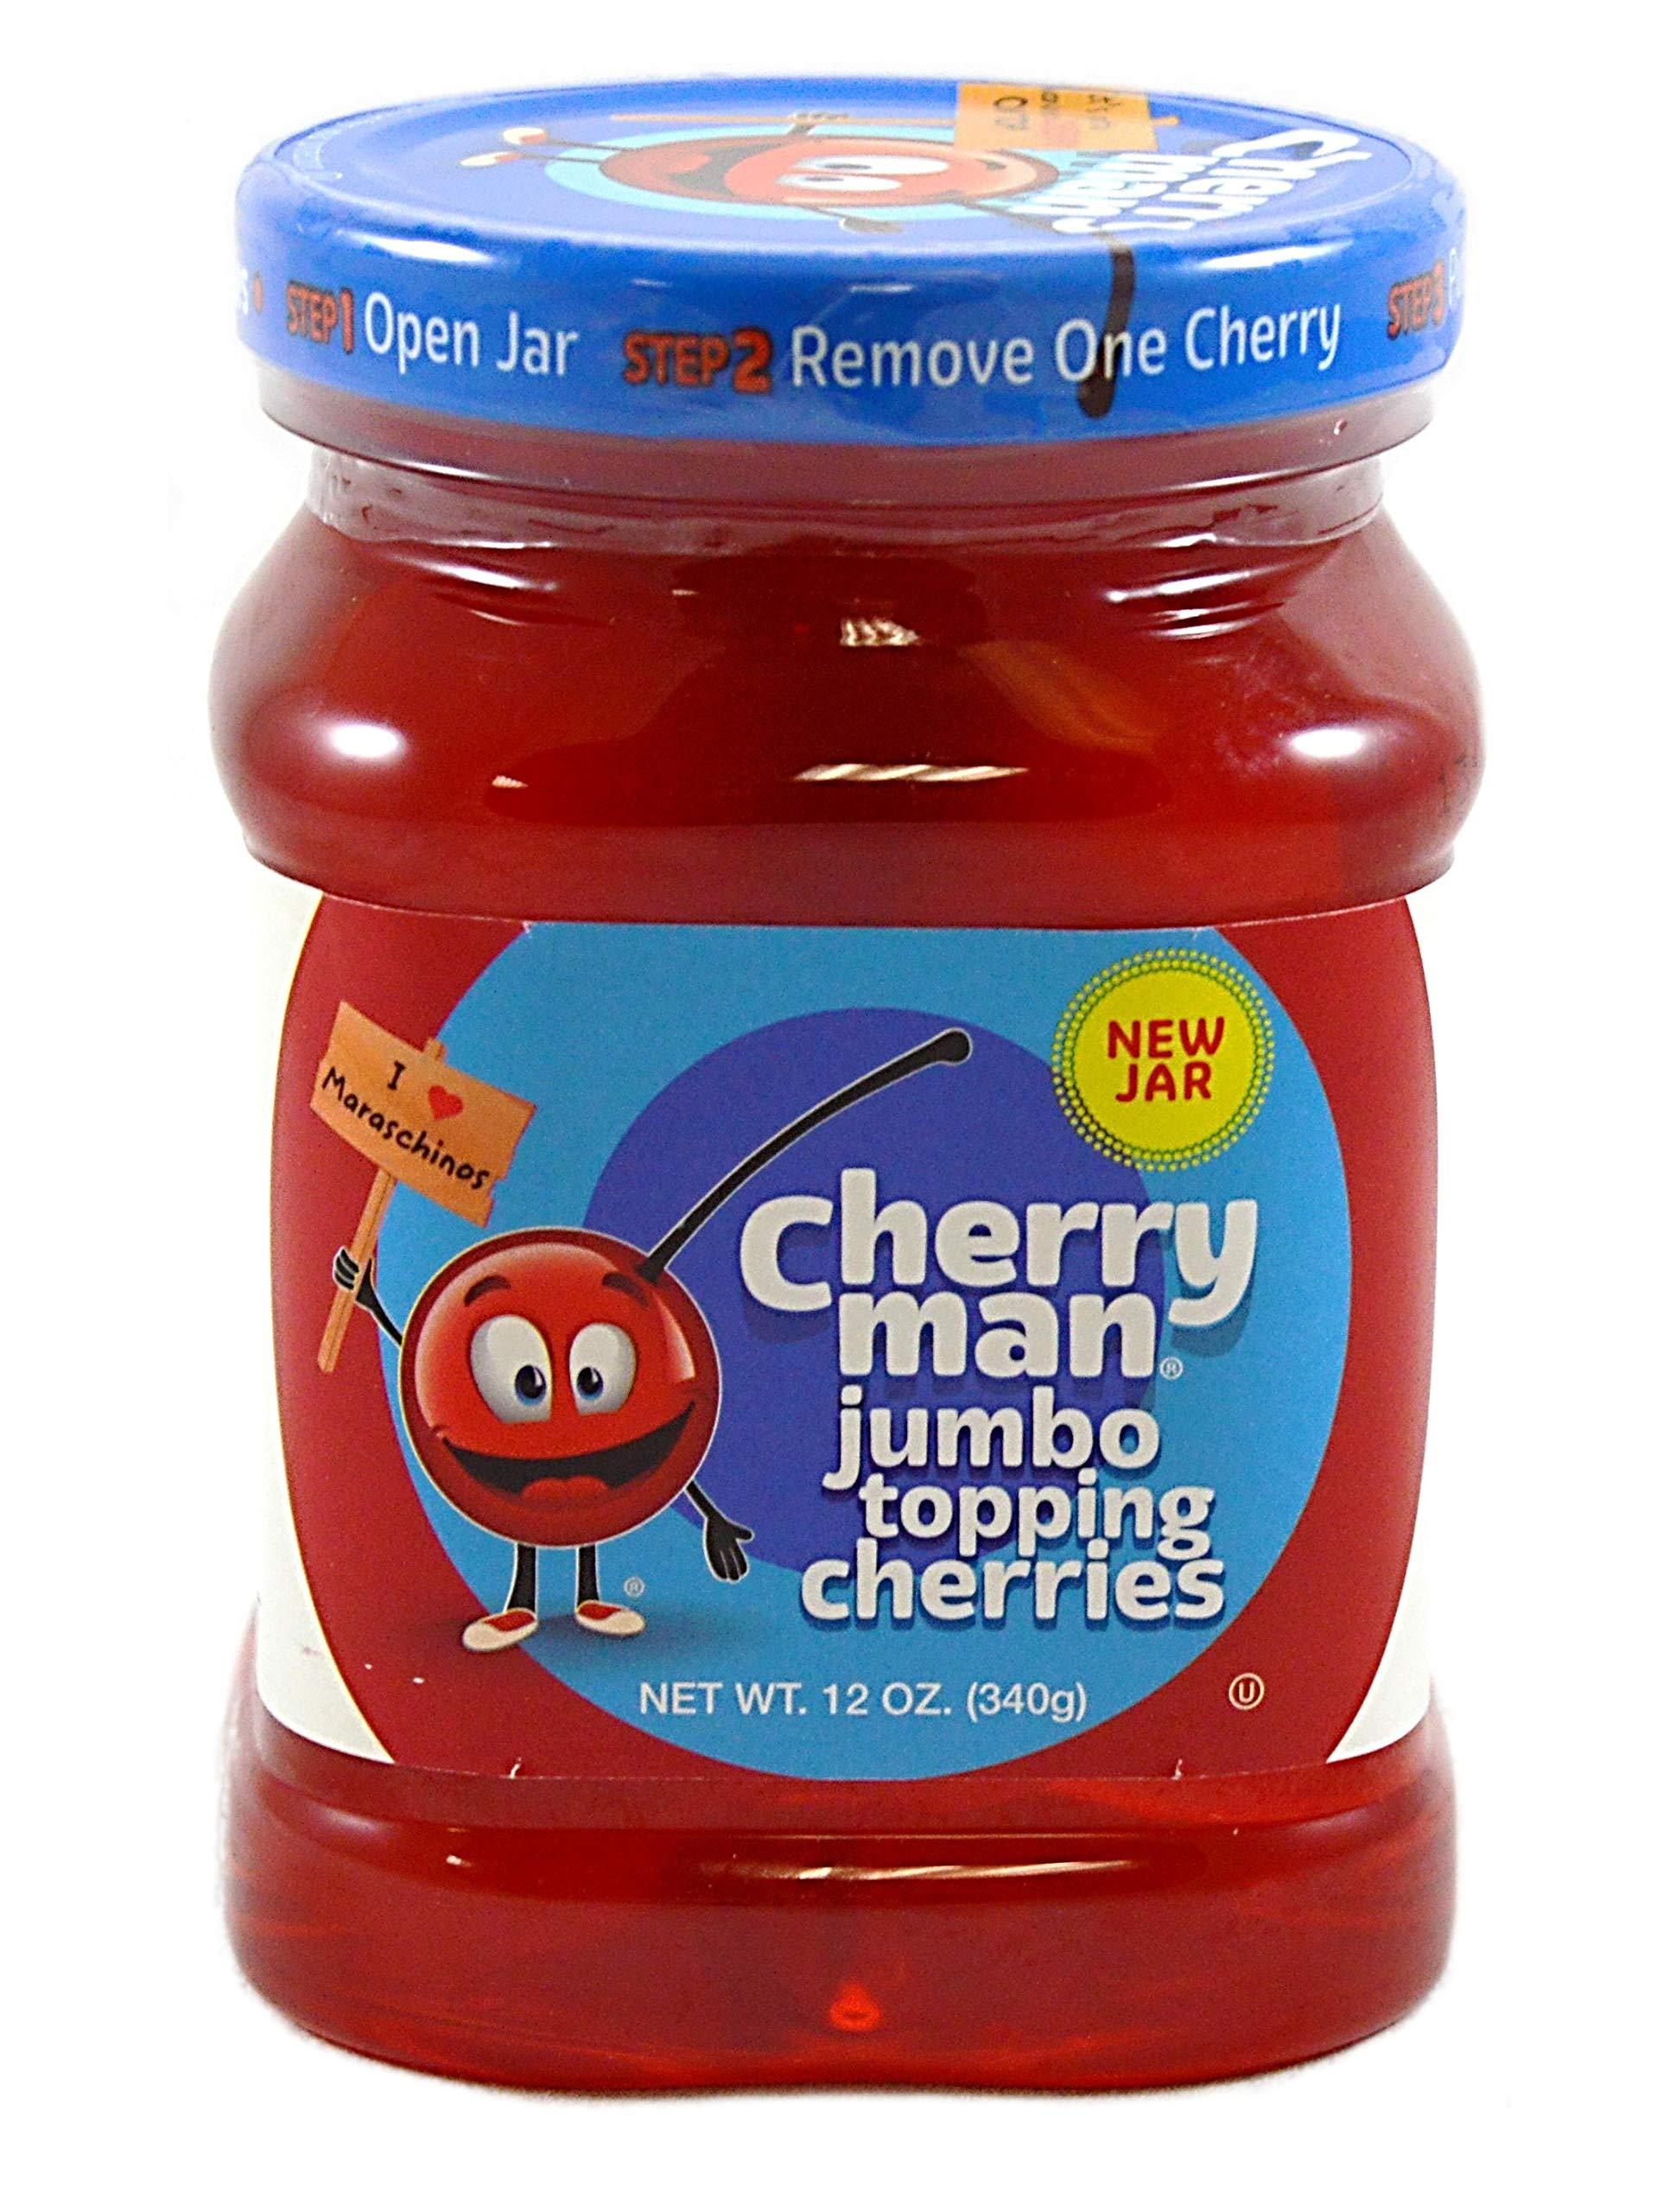 CherryMan Jumbo Topping Cherries No Stems, 12 Ounce (Pack of 12)